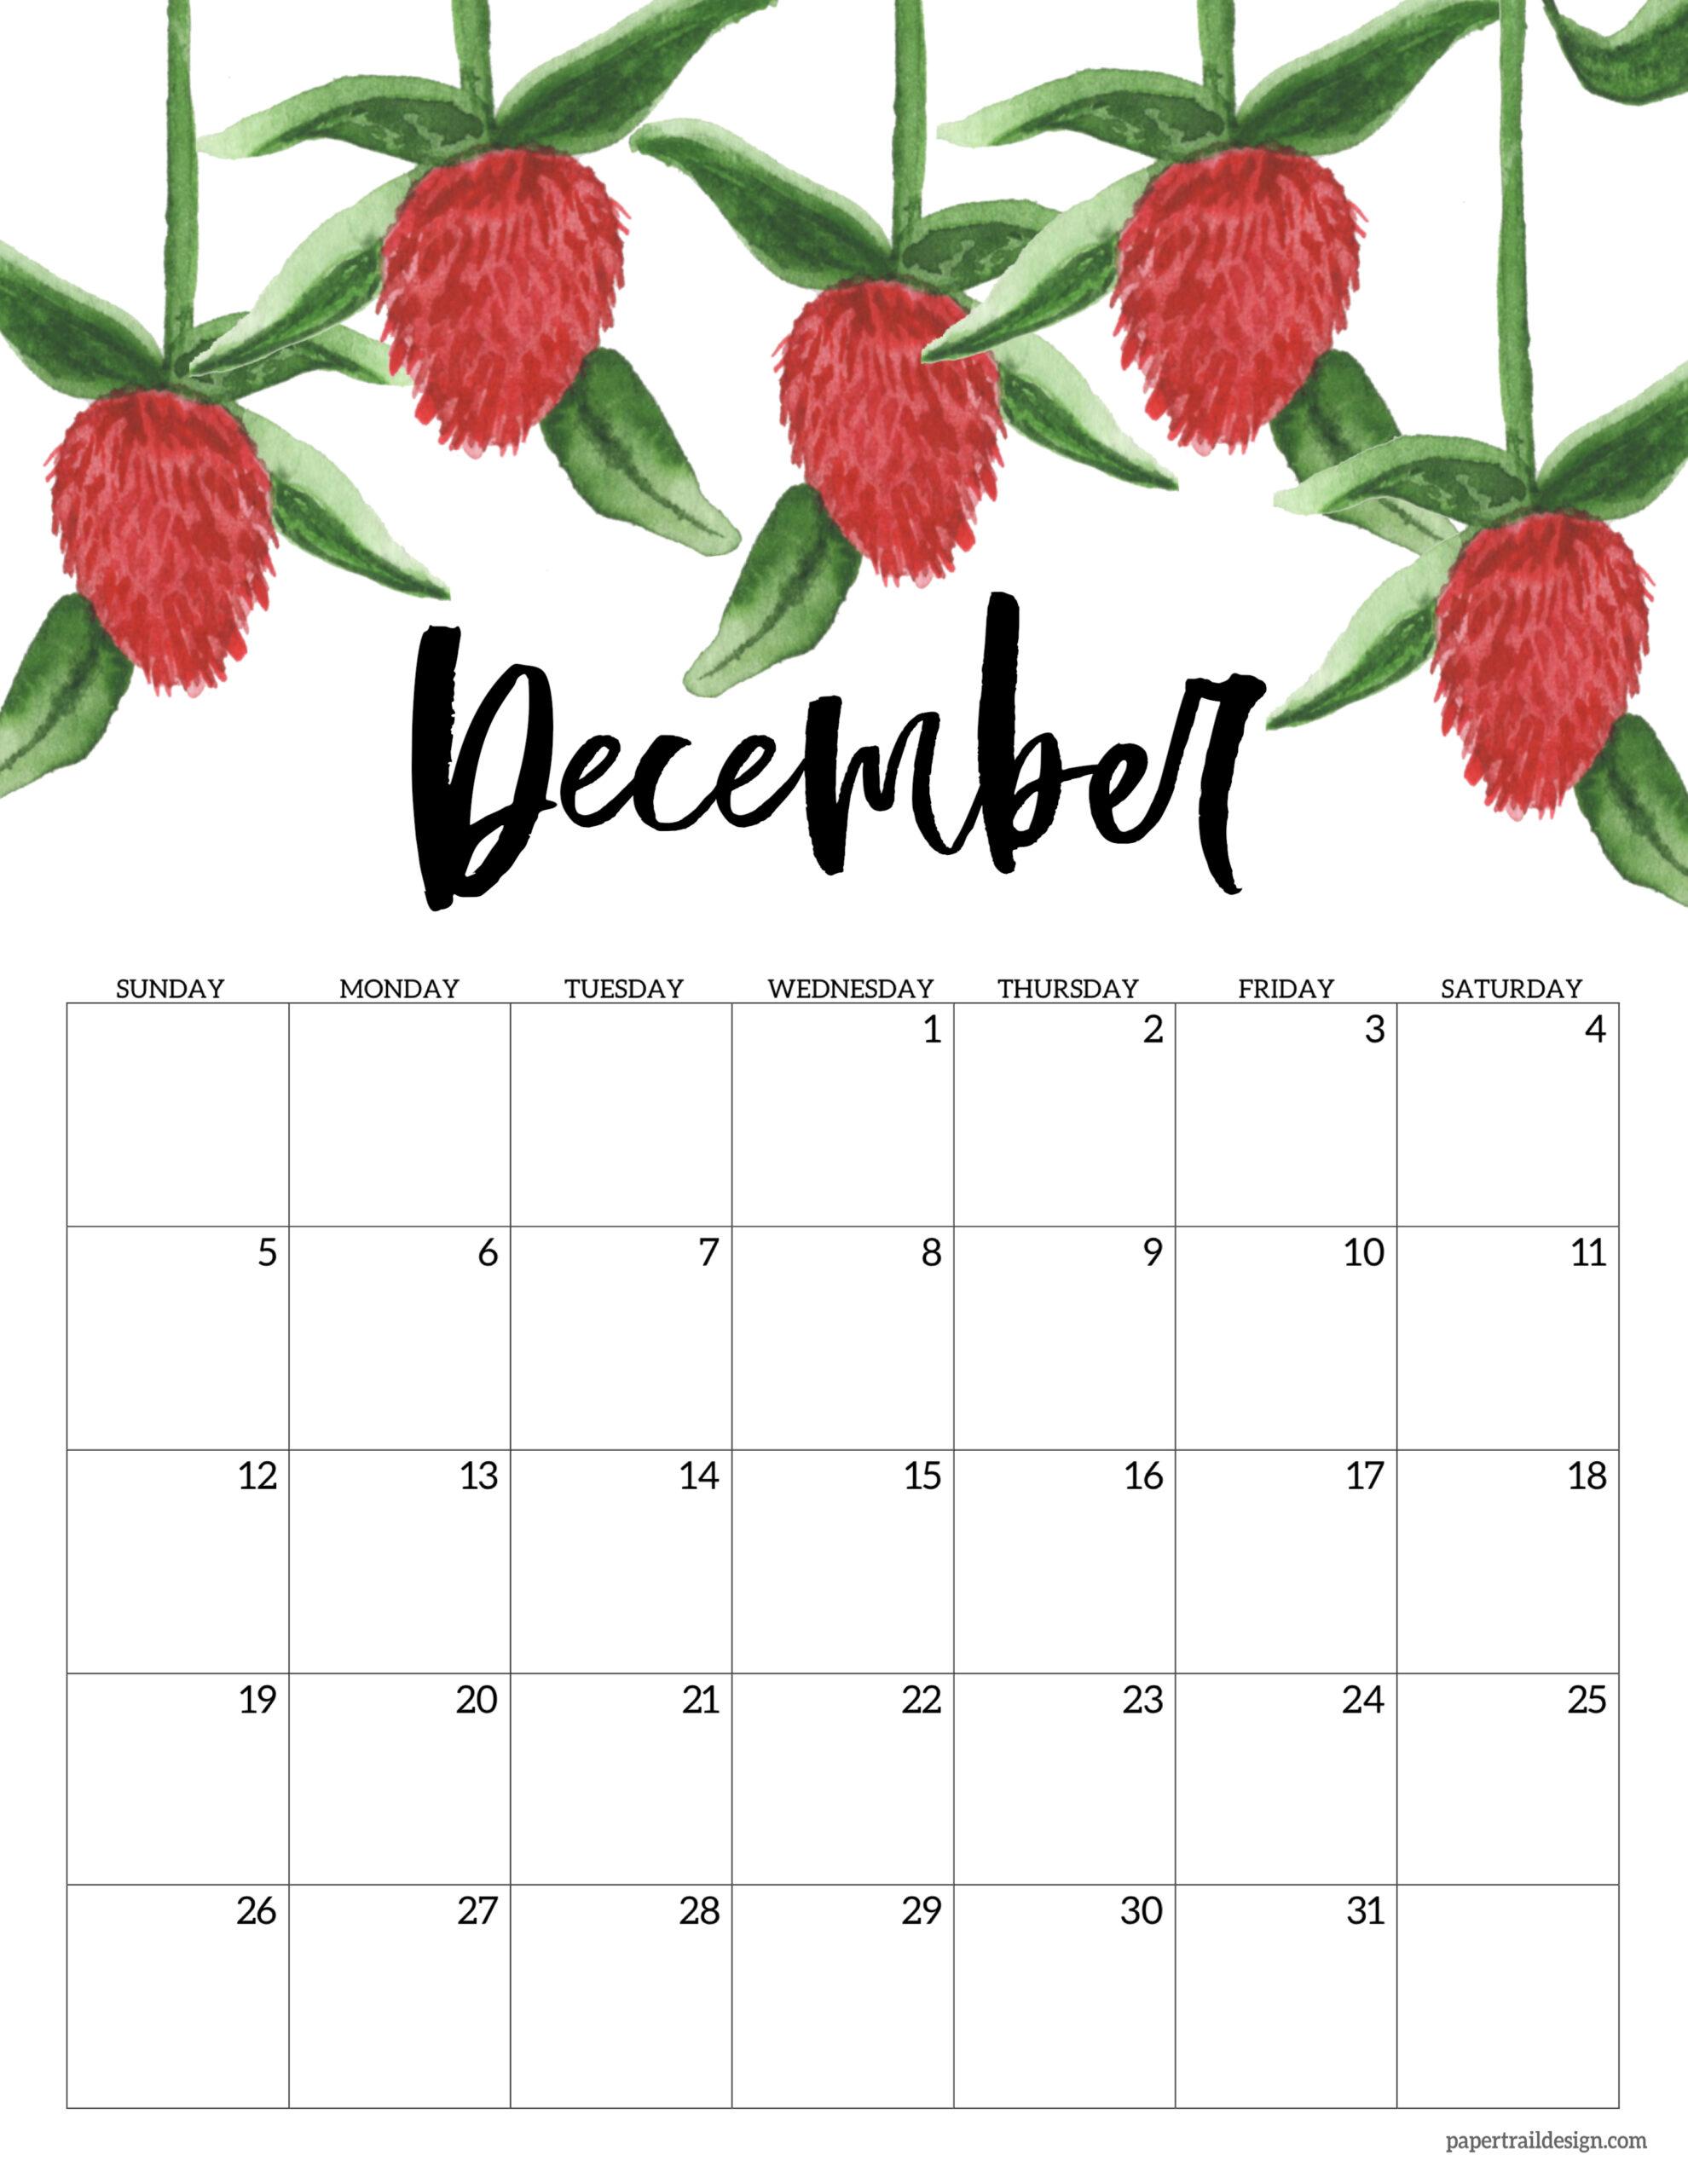 December 2021 Calendar Cute Free Printable 2021 Floral Calendar | Paper Trail Design